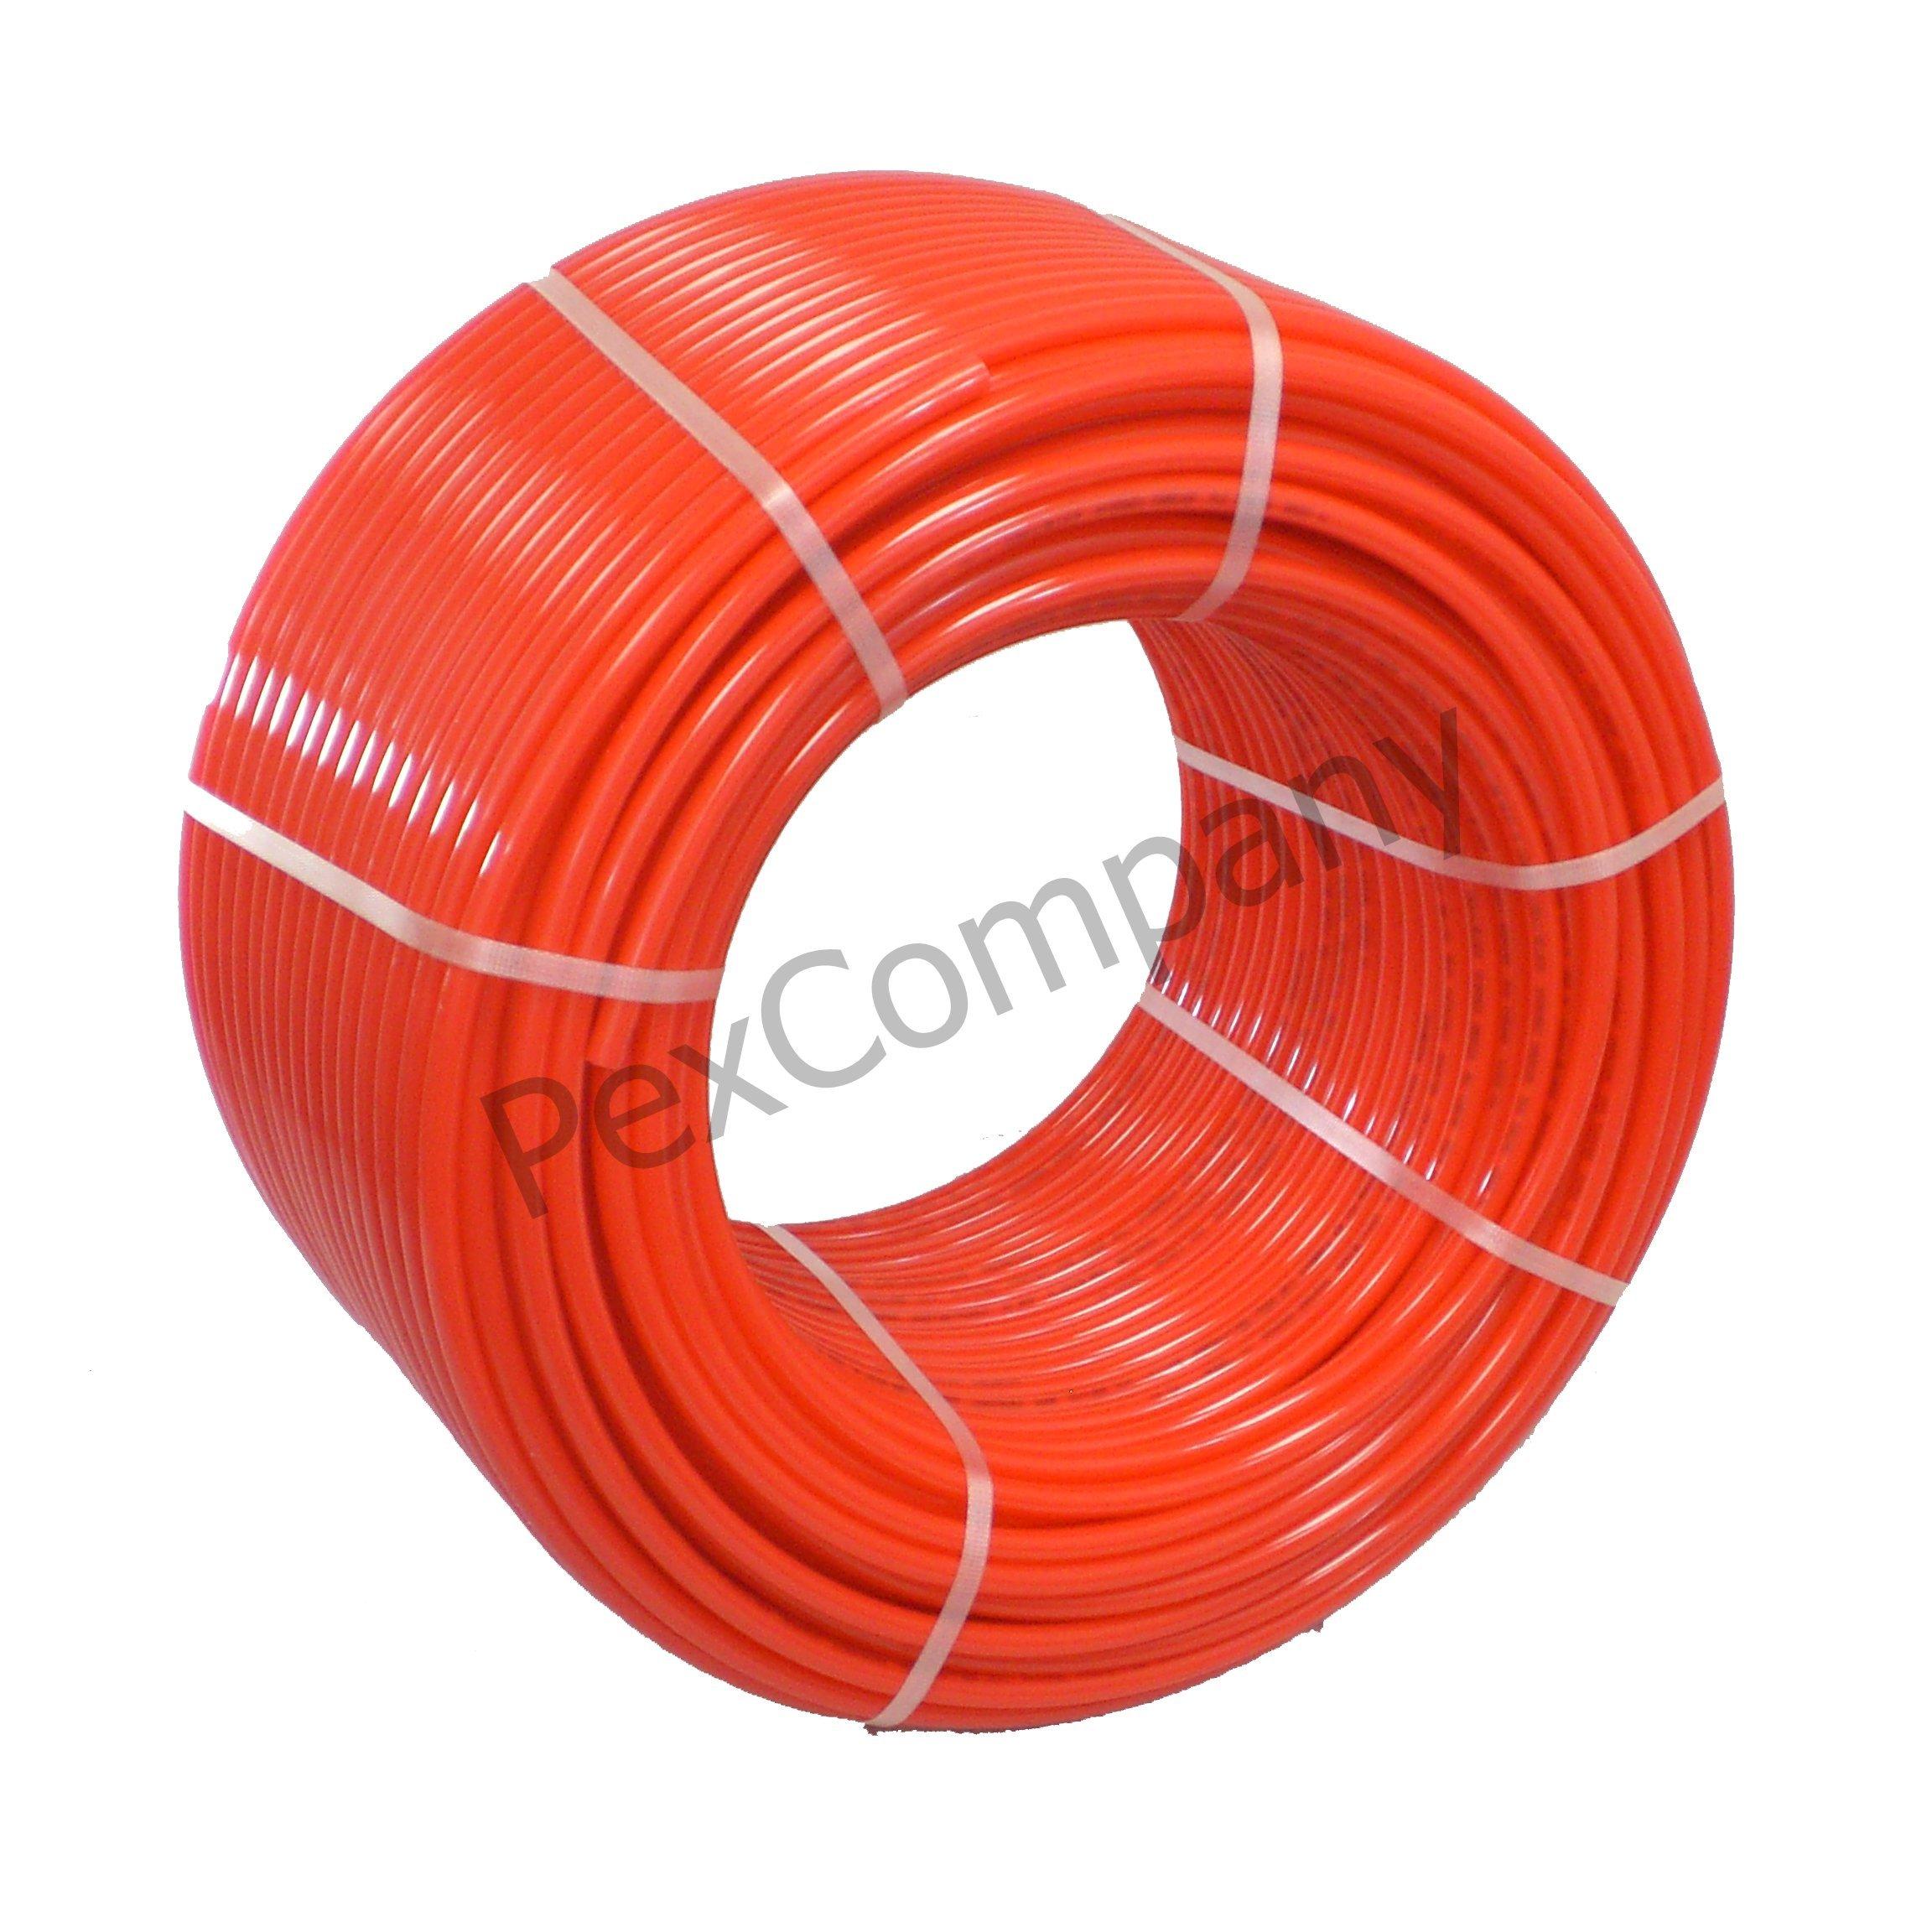 1/2 '' x 1000 ft PEX O2 Barrier Radiant Heat Tubing